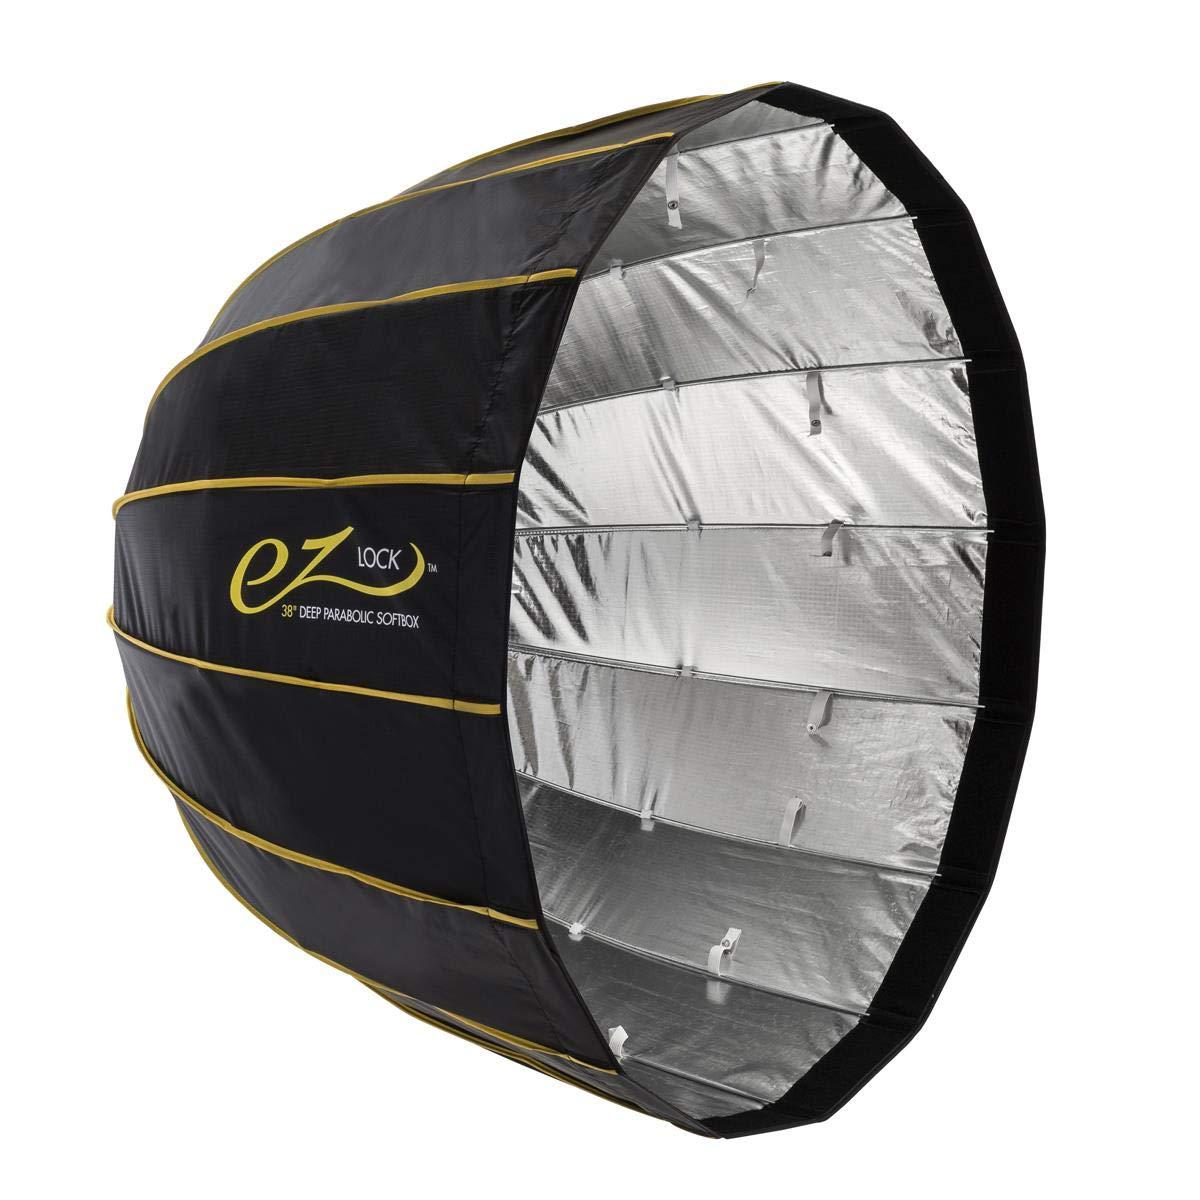 Glow EZ Lock Deep Parabolic Quick Softbox (38'') by Glow